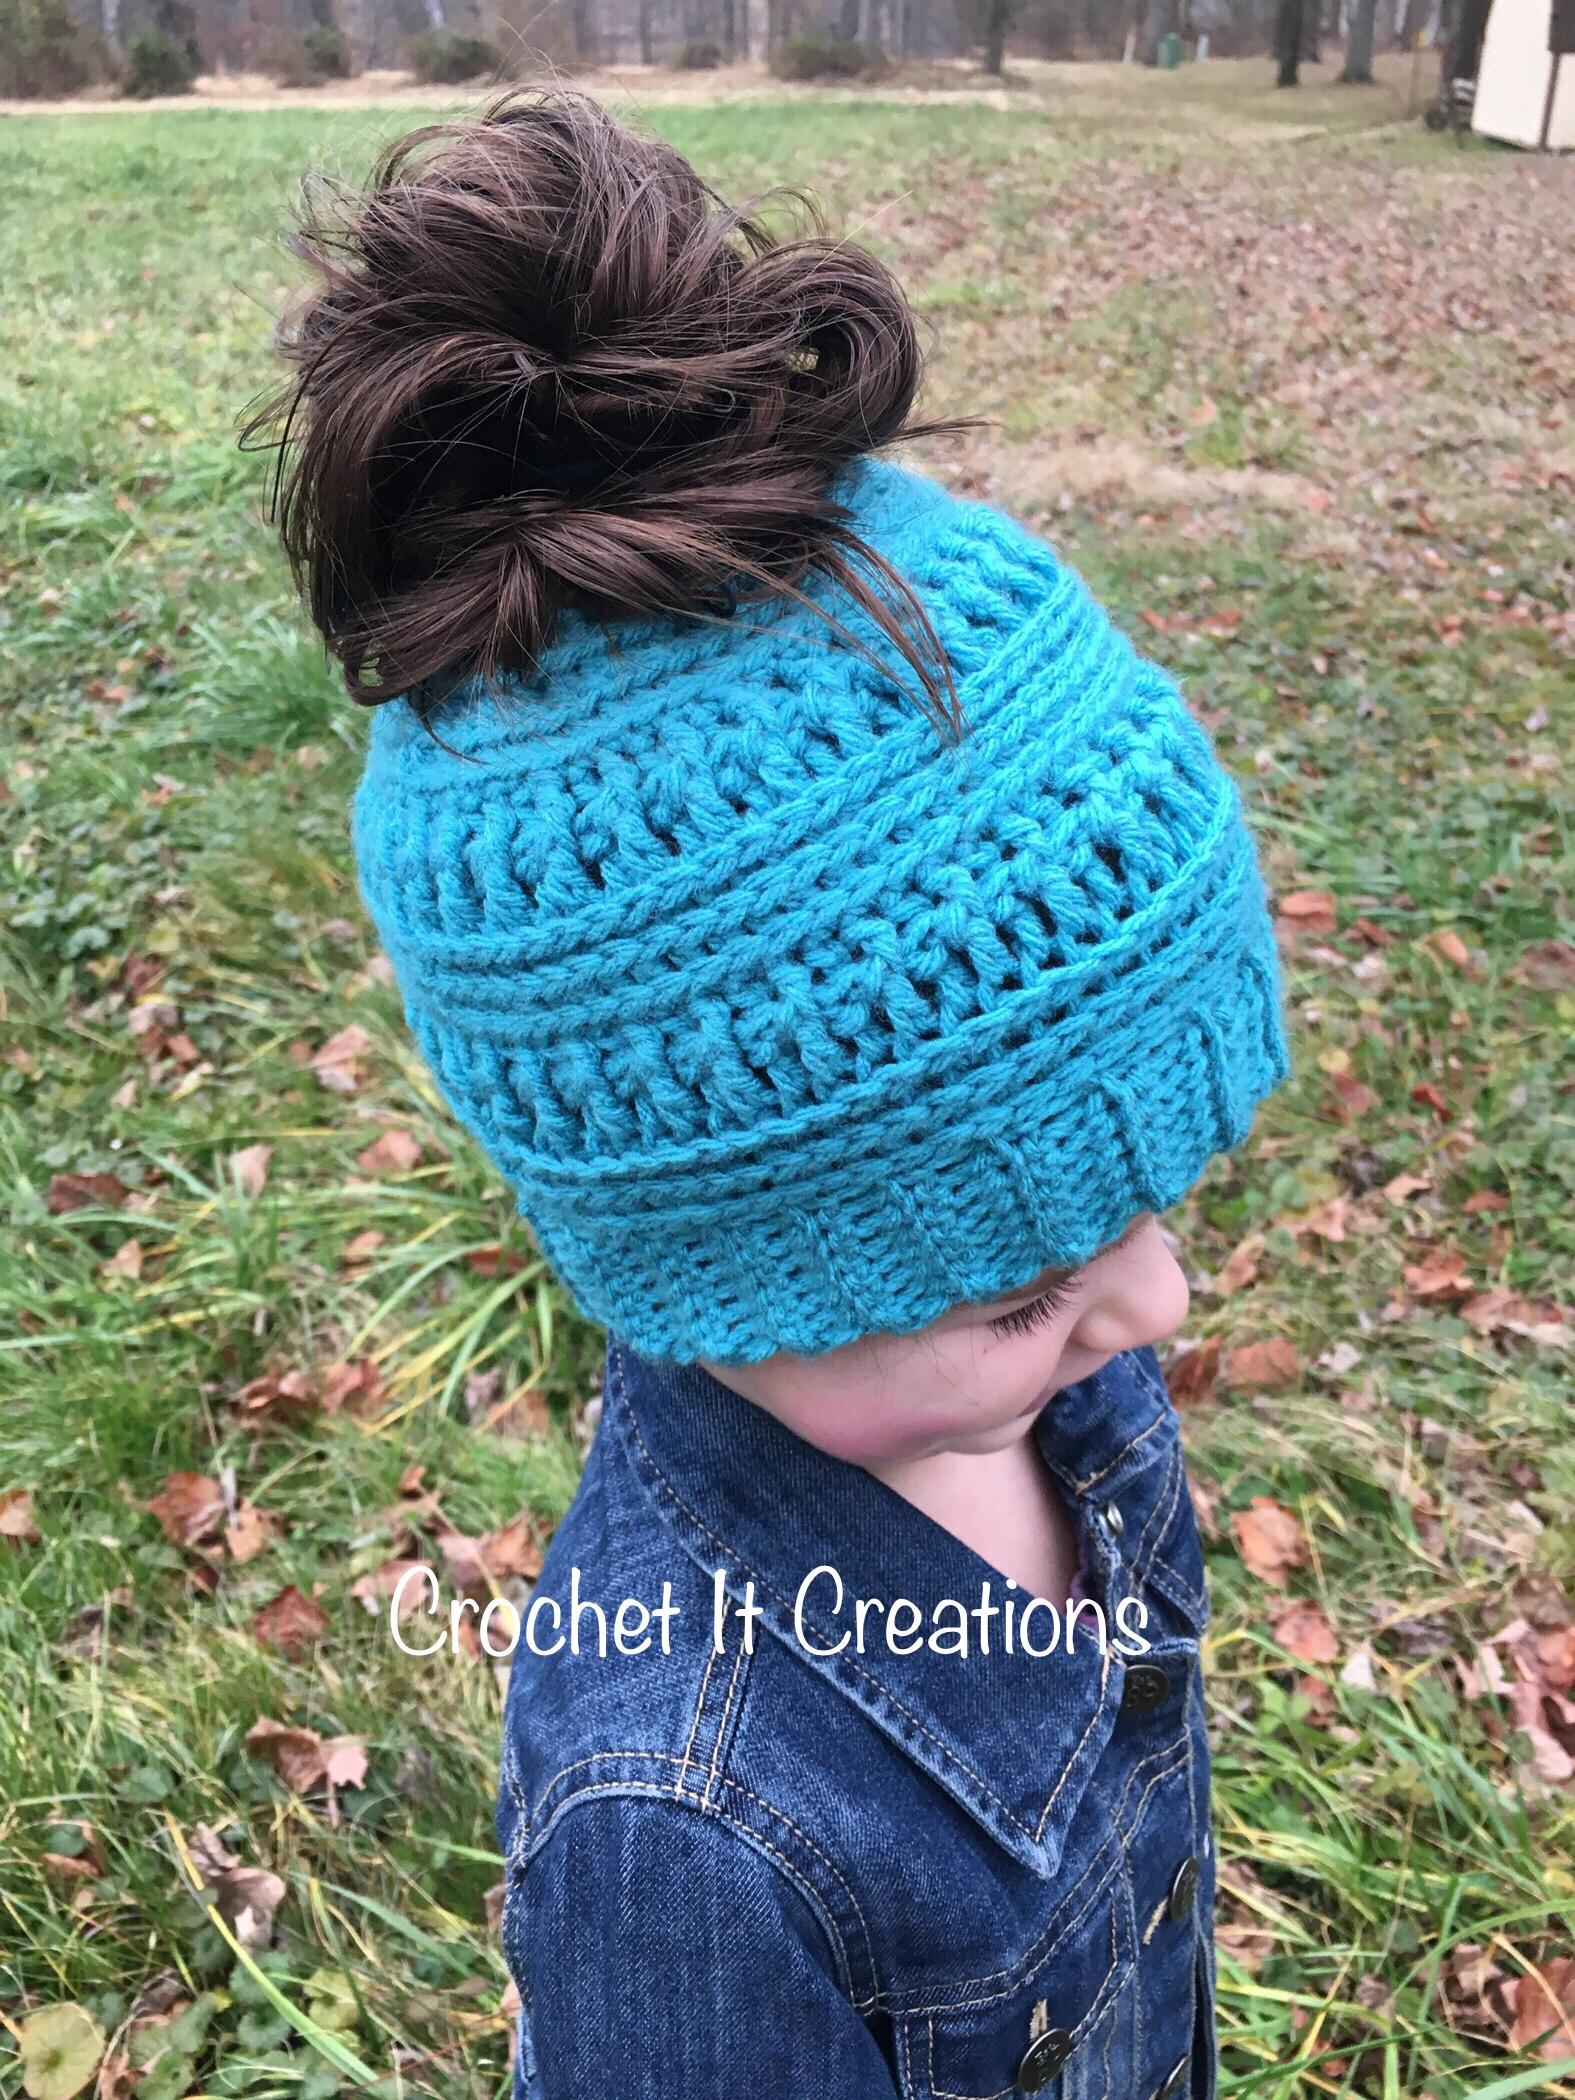 The Gracie Messy Bun Beanie Crochet Pattern Crochet It Creations